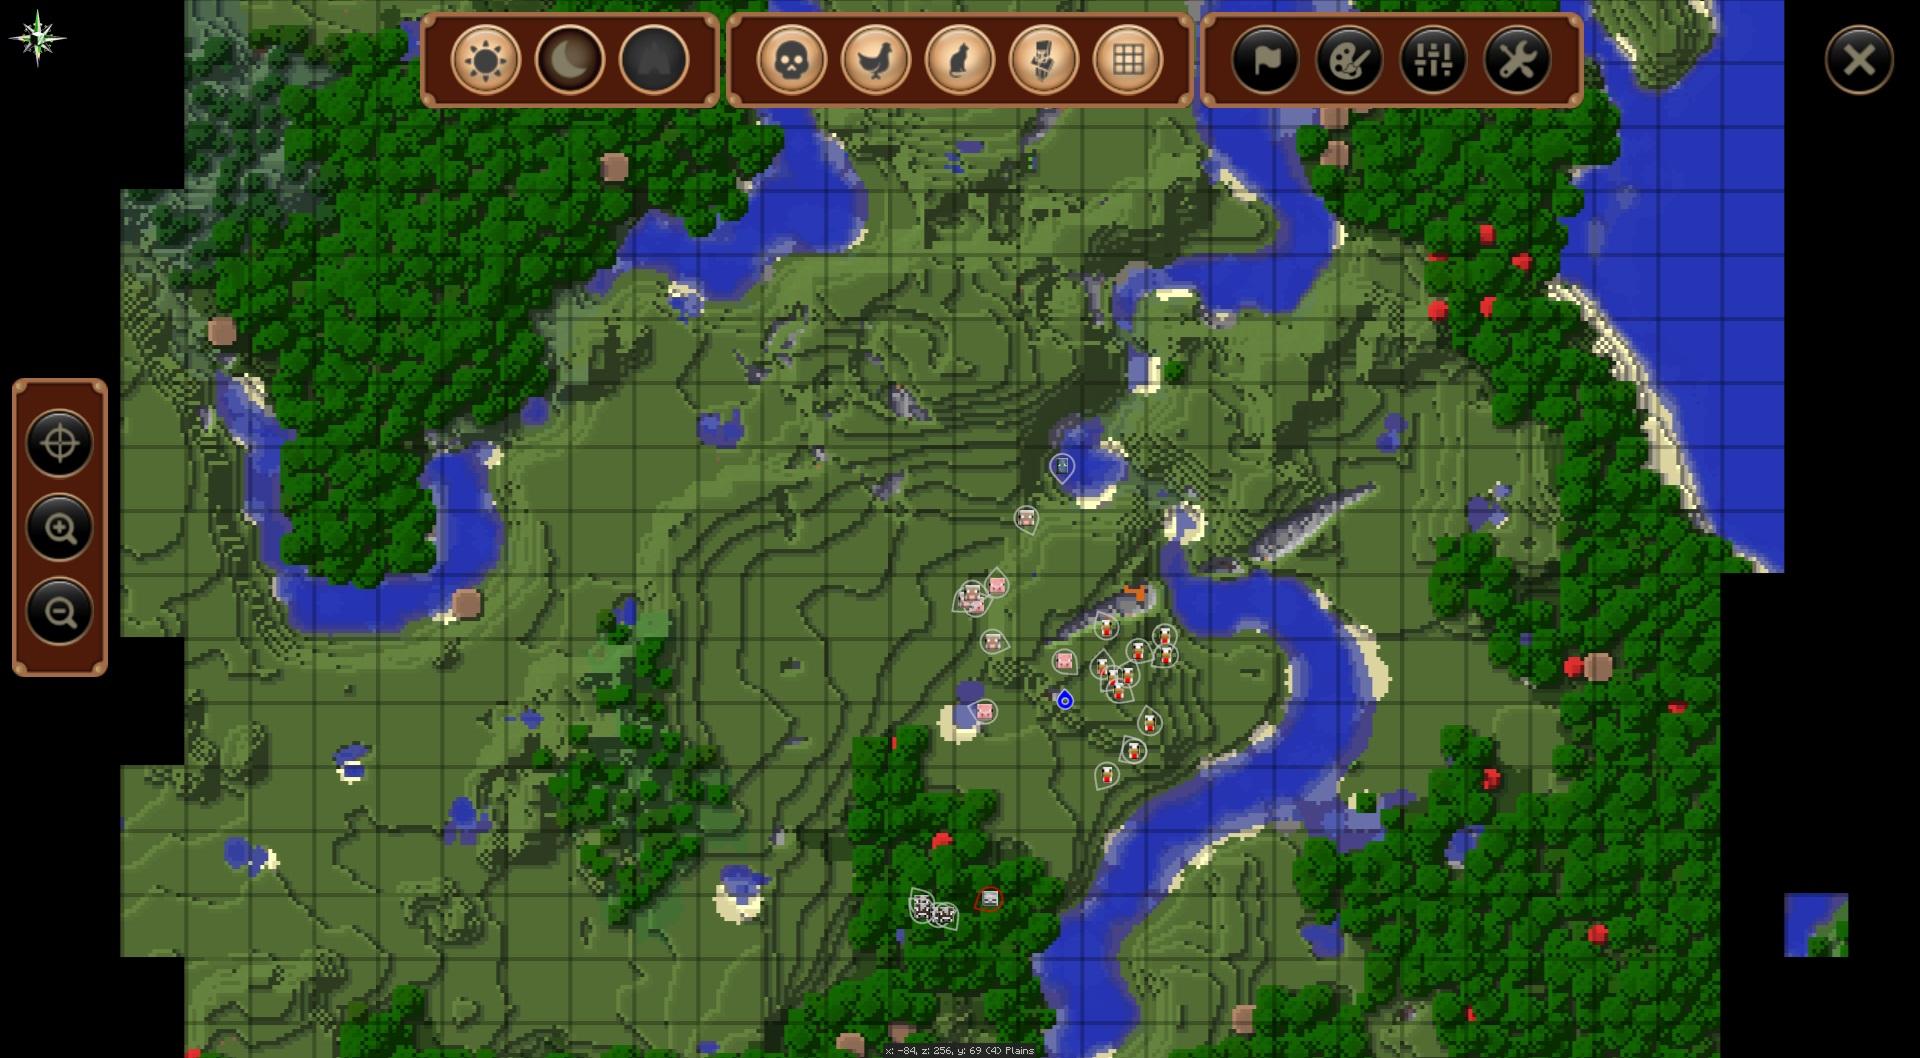 Journey Map Mod JourneyMap Mod [1.9] [1.8.9] [1.8] [1.7.10] / Minecraft Mods